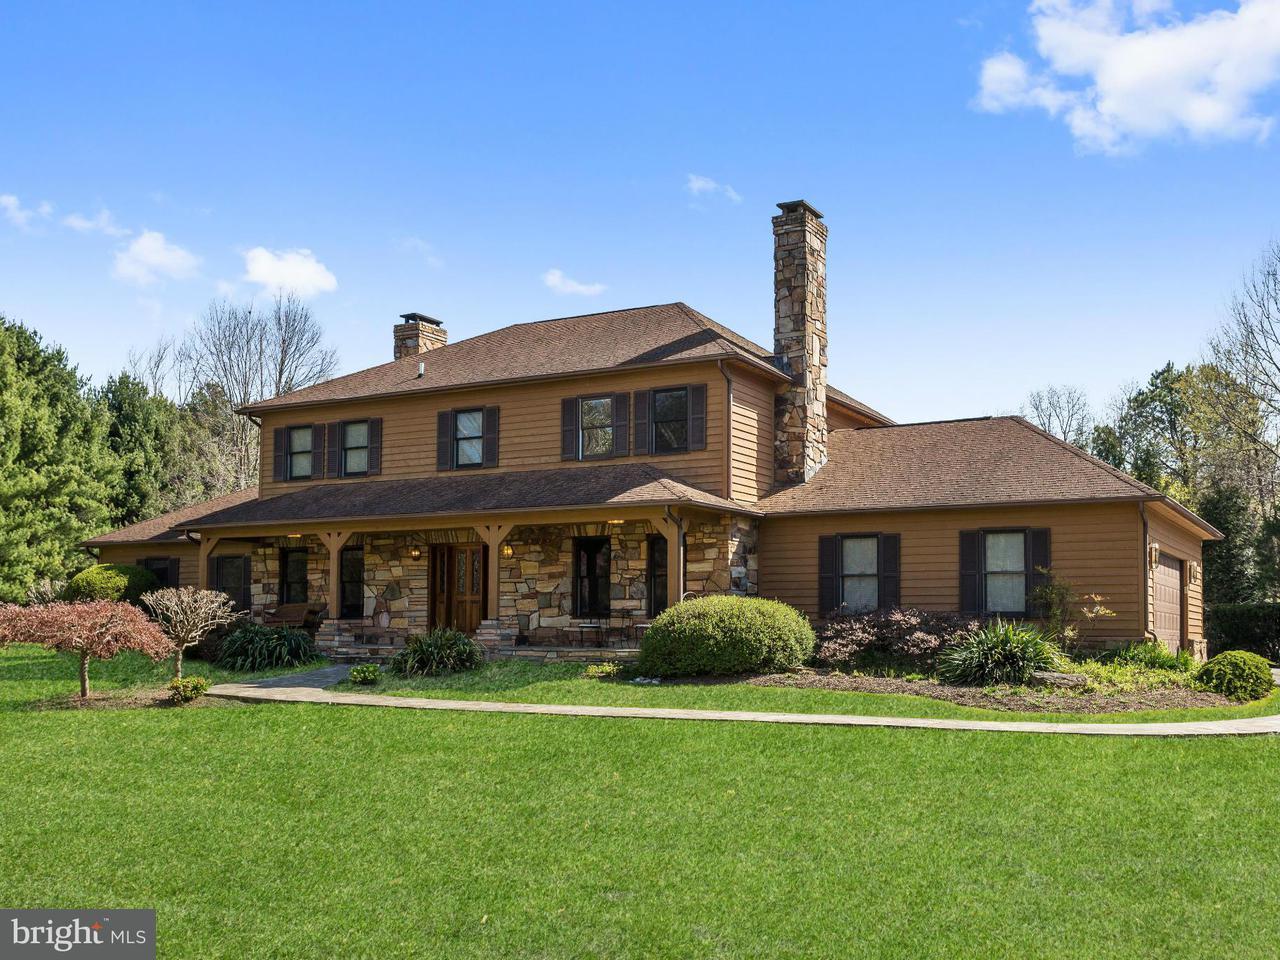 Single Family Home for Sale at 5233 Kalmia Drive 5233 Kalmia Drive Dayton, Maryland 21036 United States